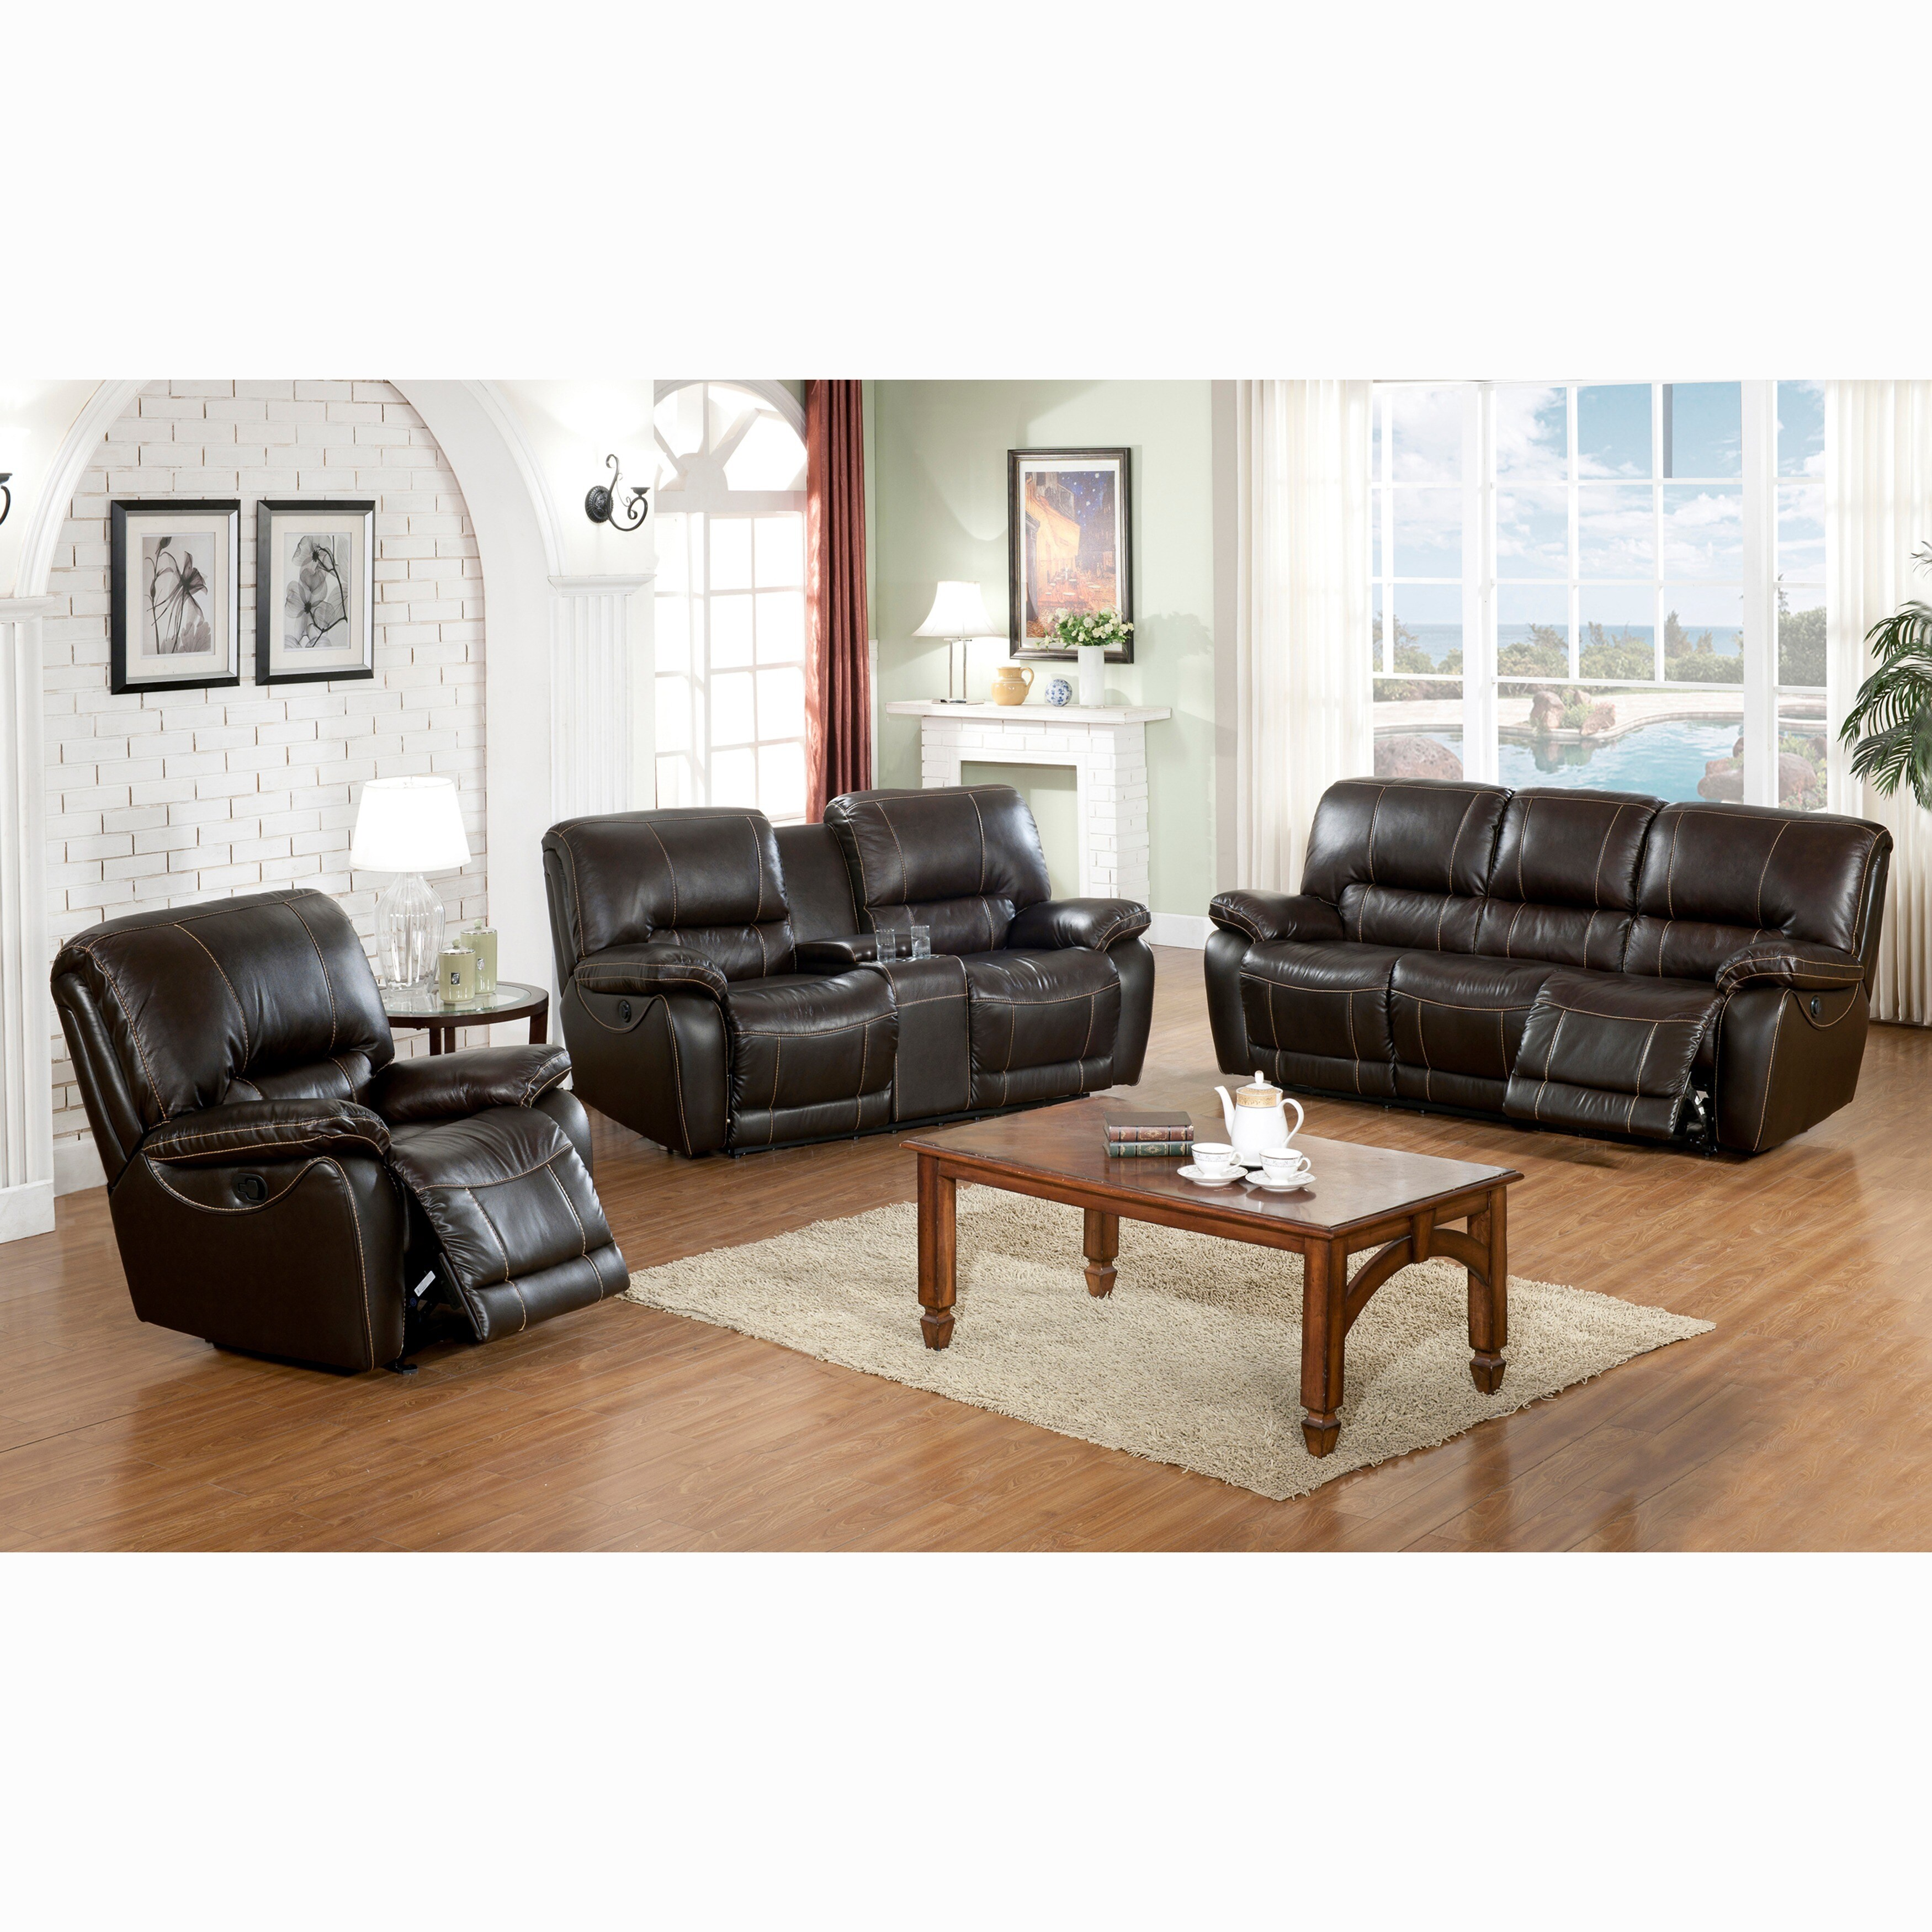 Walton Brown Top Grain Leather Power Reclining Sofa, Love...